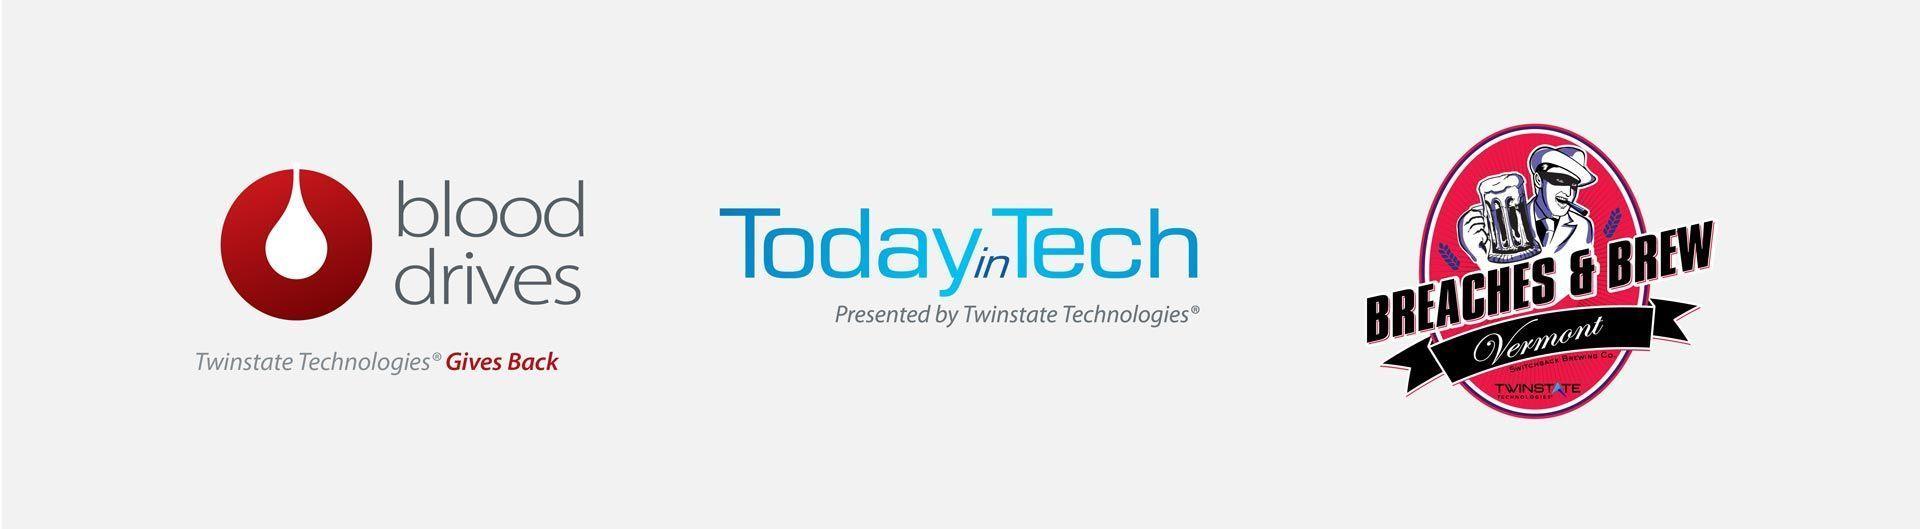 twinstate branding Event Logos